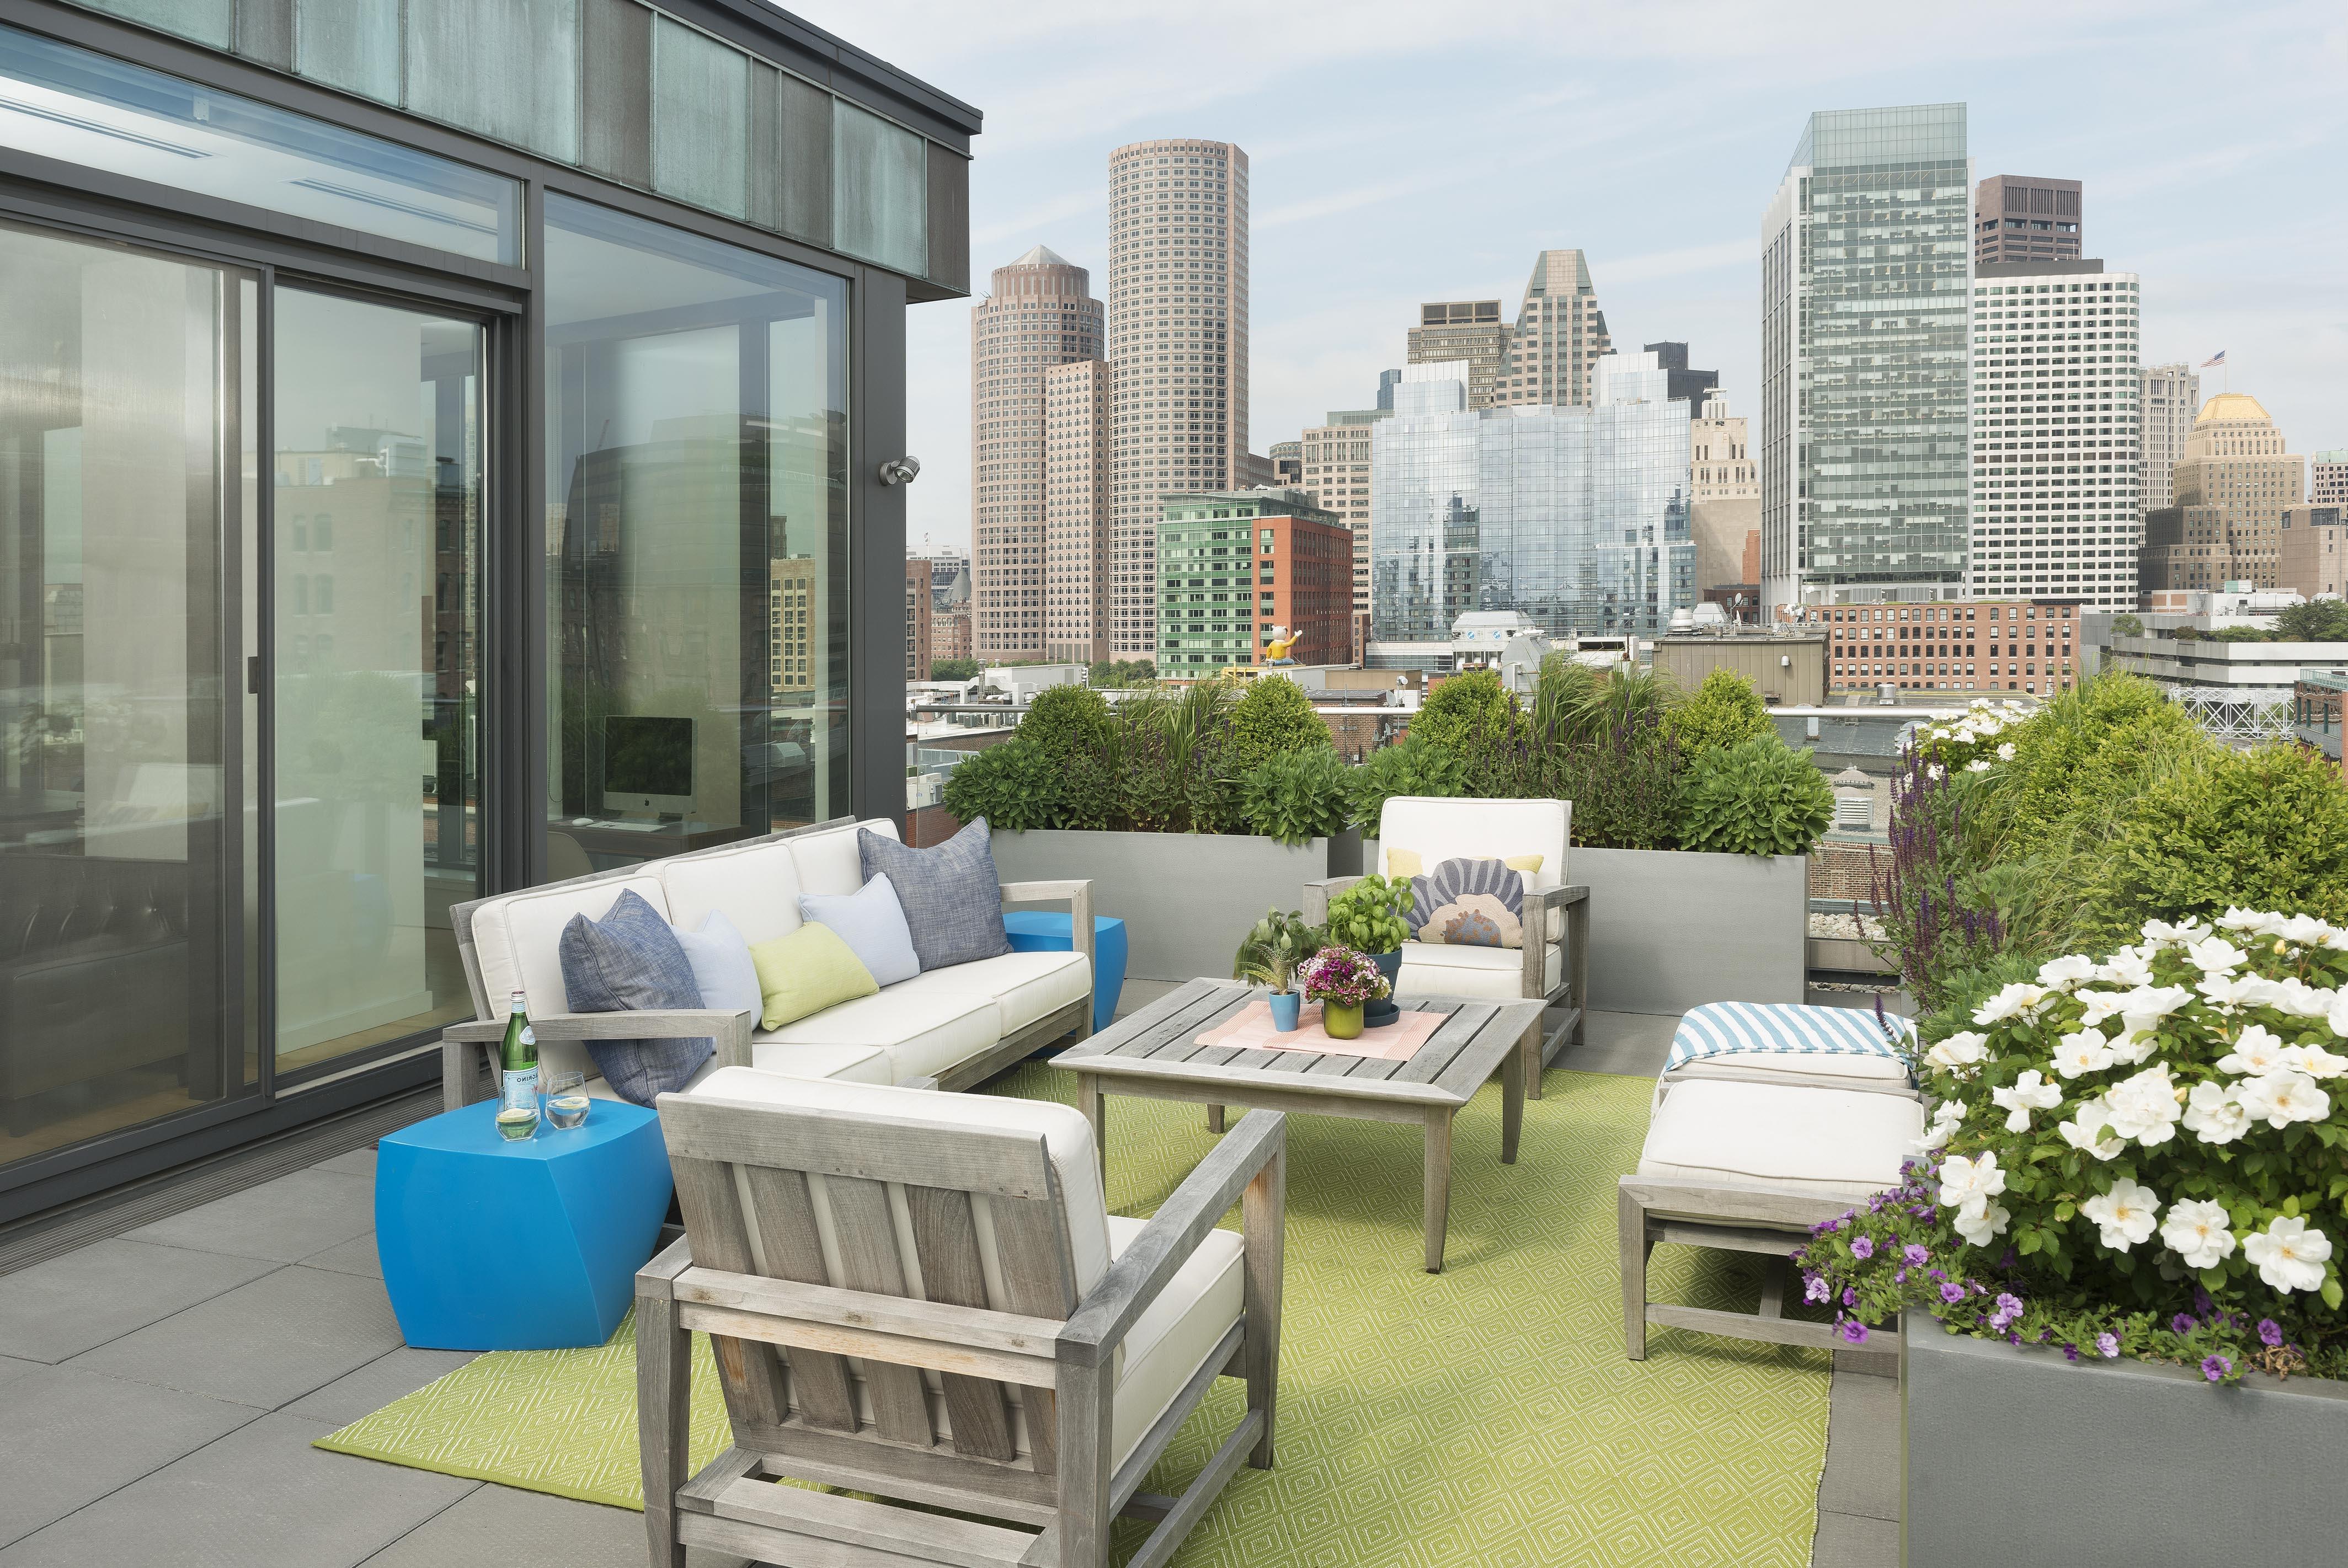 Minimalist Rooftop Garden Landscape (Image 11 of 28)